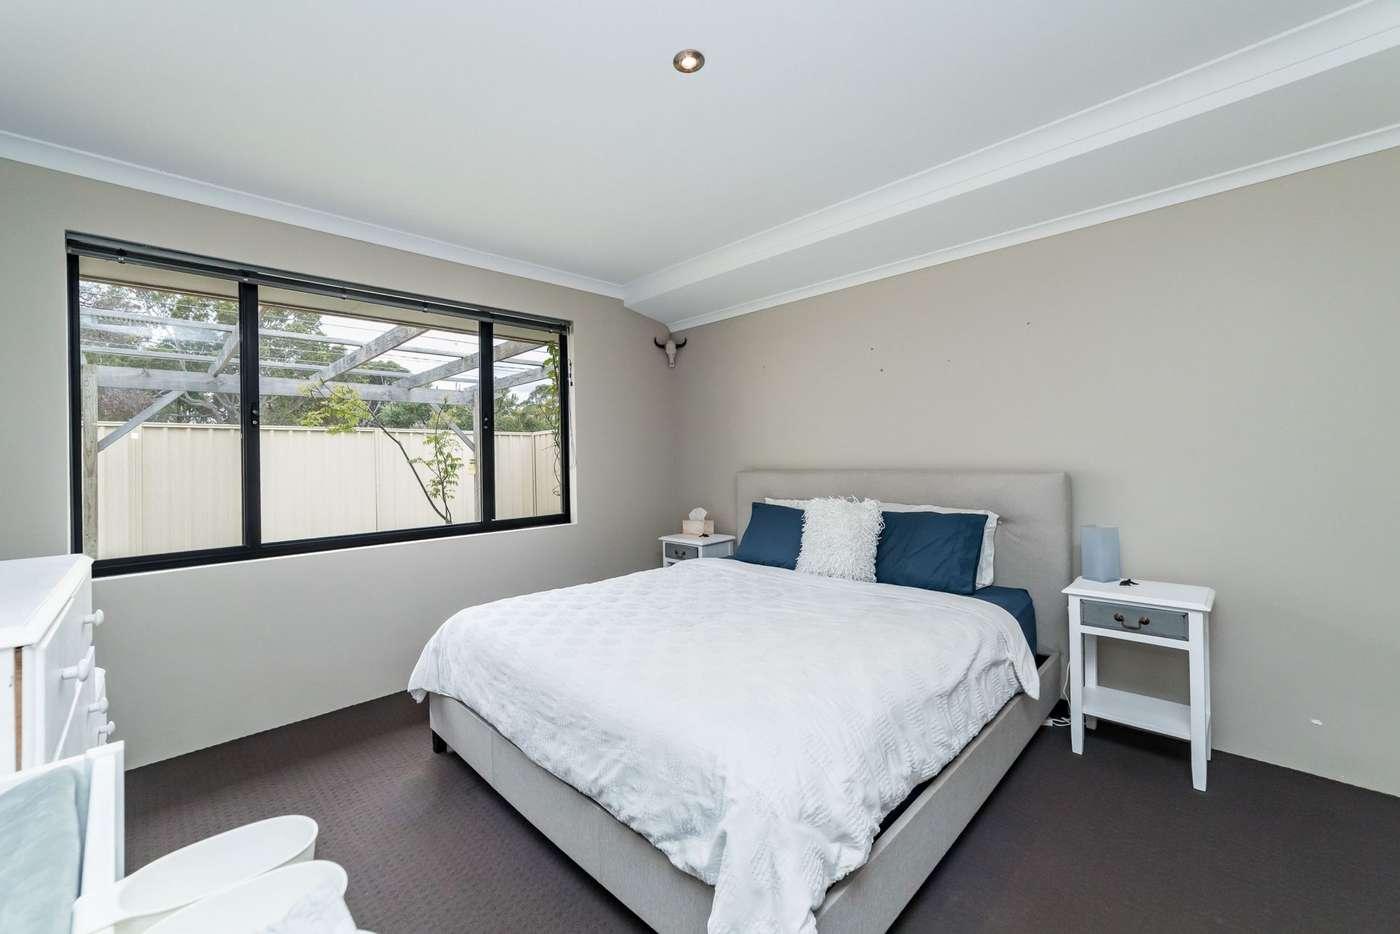 Sixth view of Homely house listing, 8 Molokai Close, Falcon WA 6210